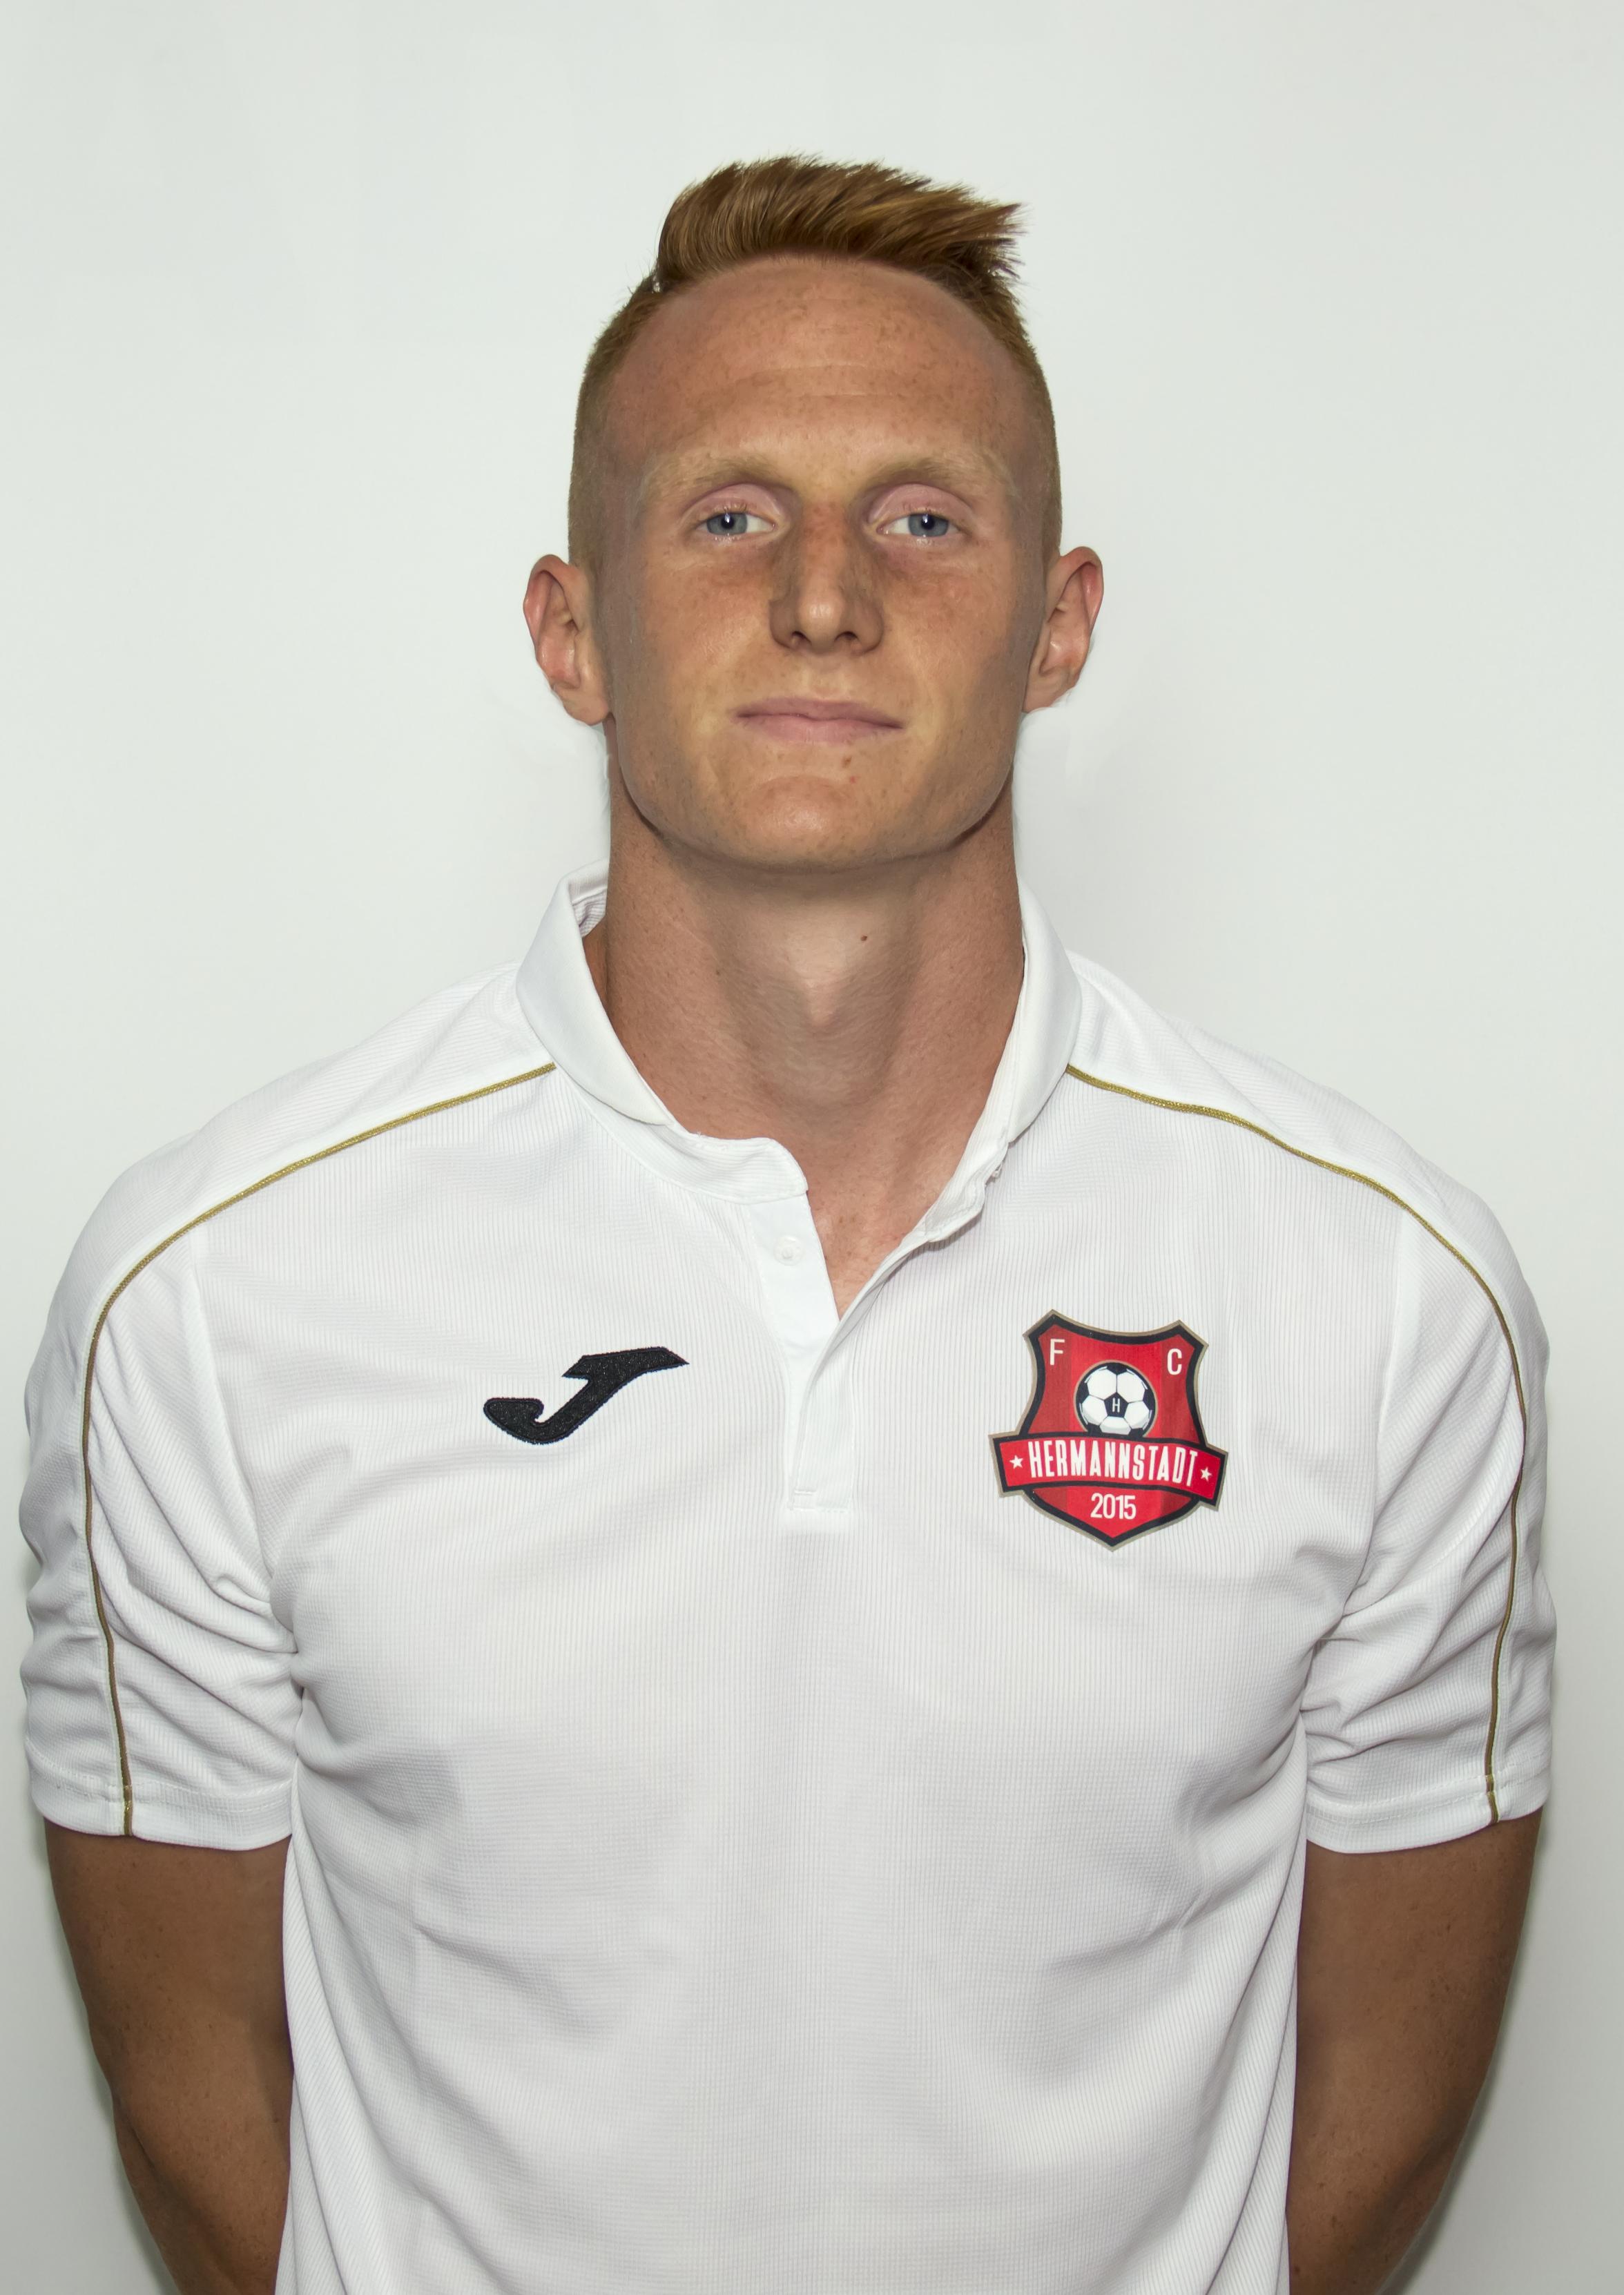 Stjepan Plazonja